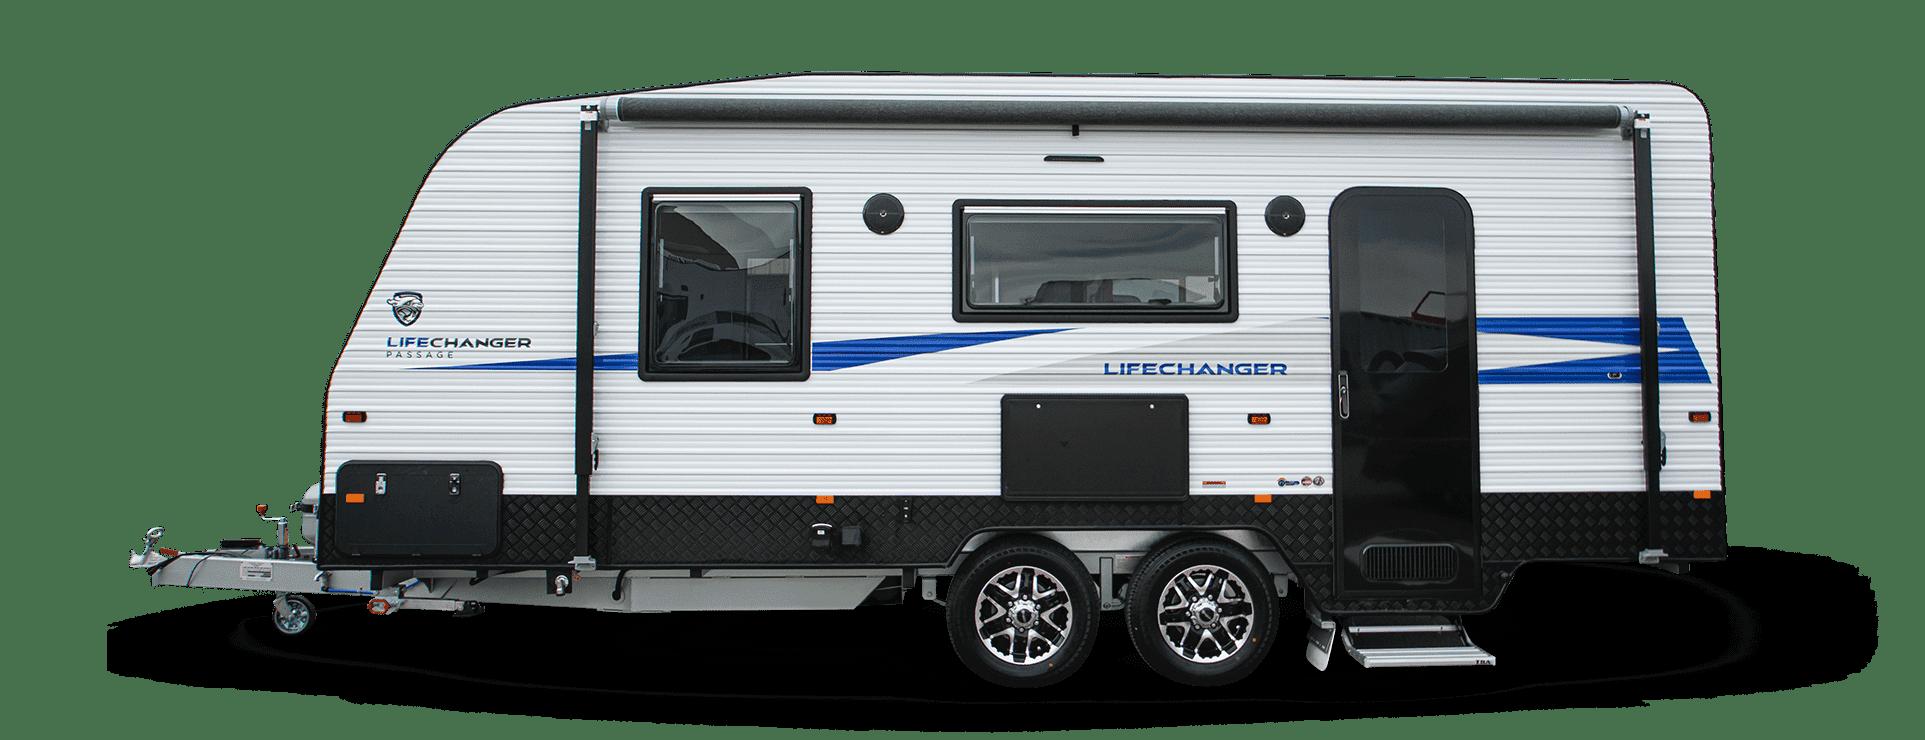 Crusader Lifechanger Passage caravan for sale.